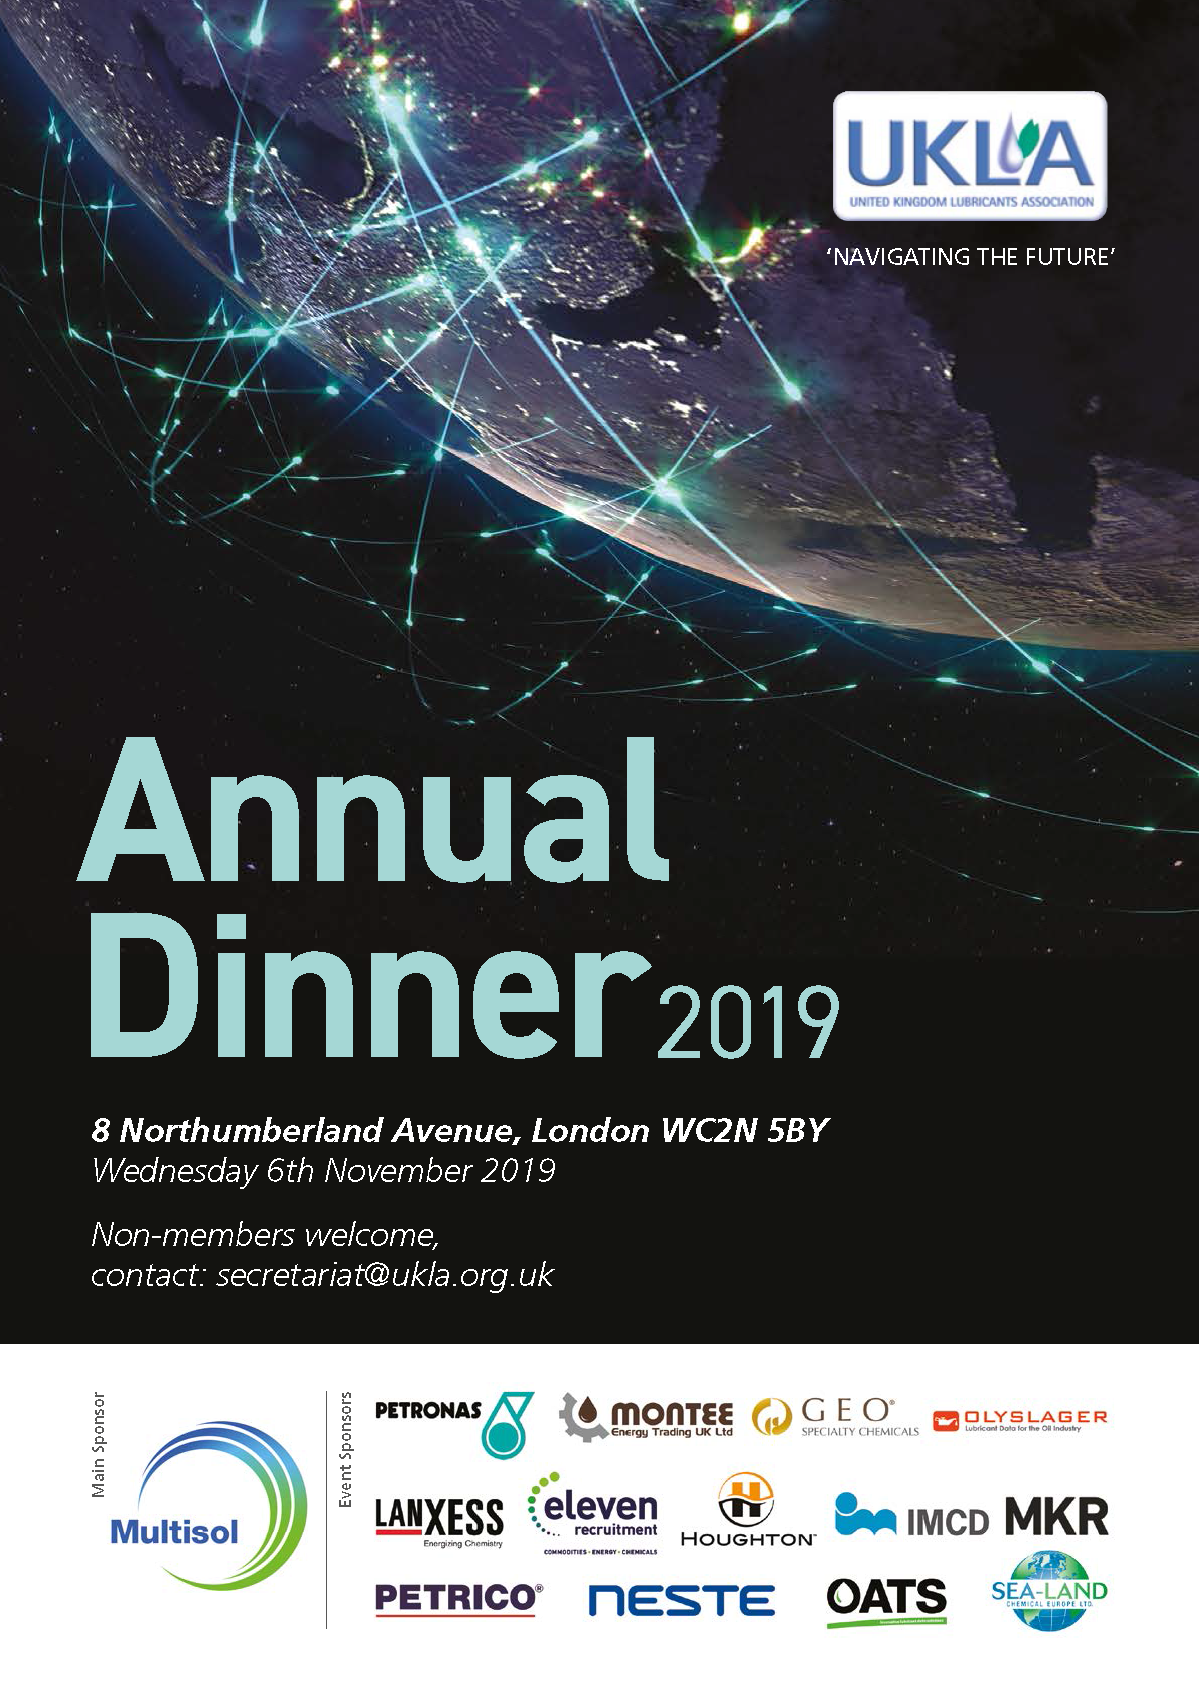 Dinner Ad 2019 A4 (Web)